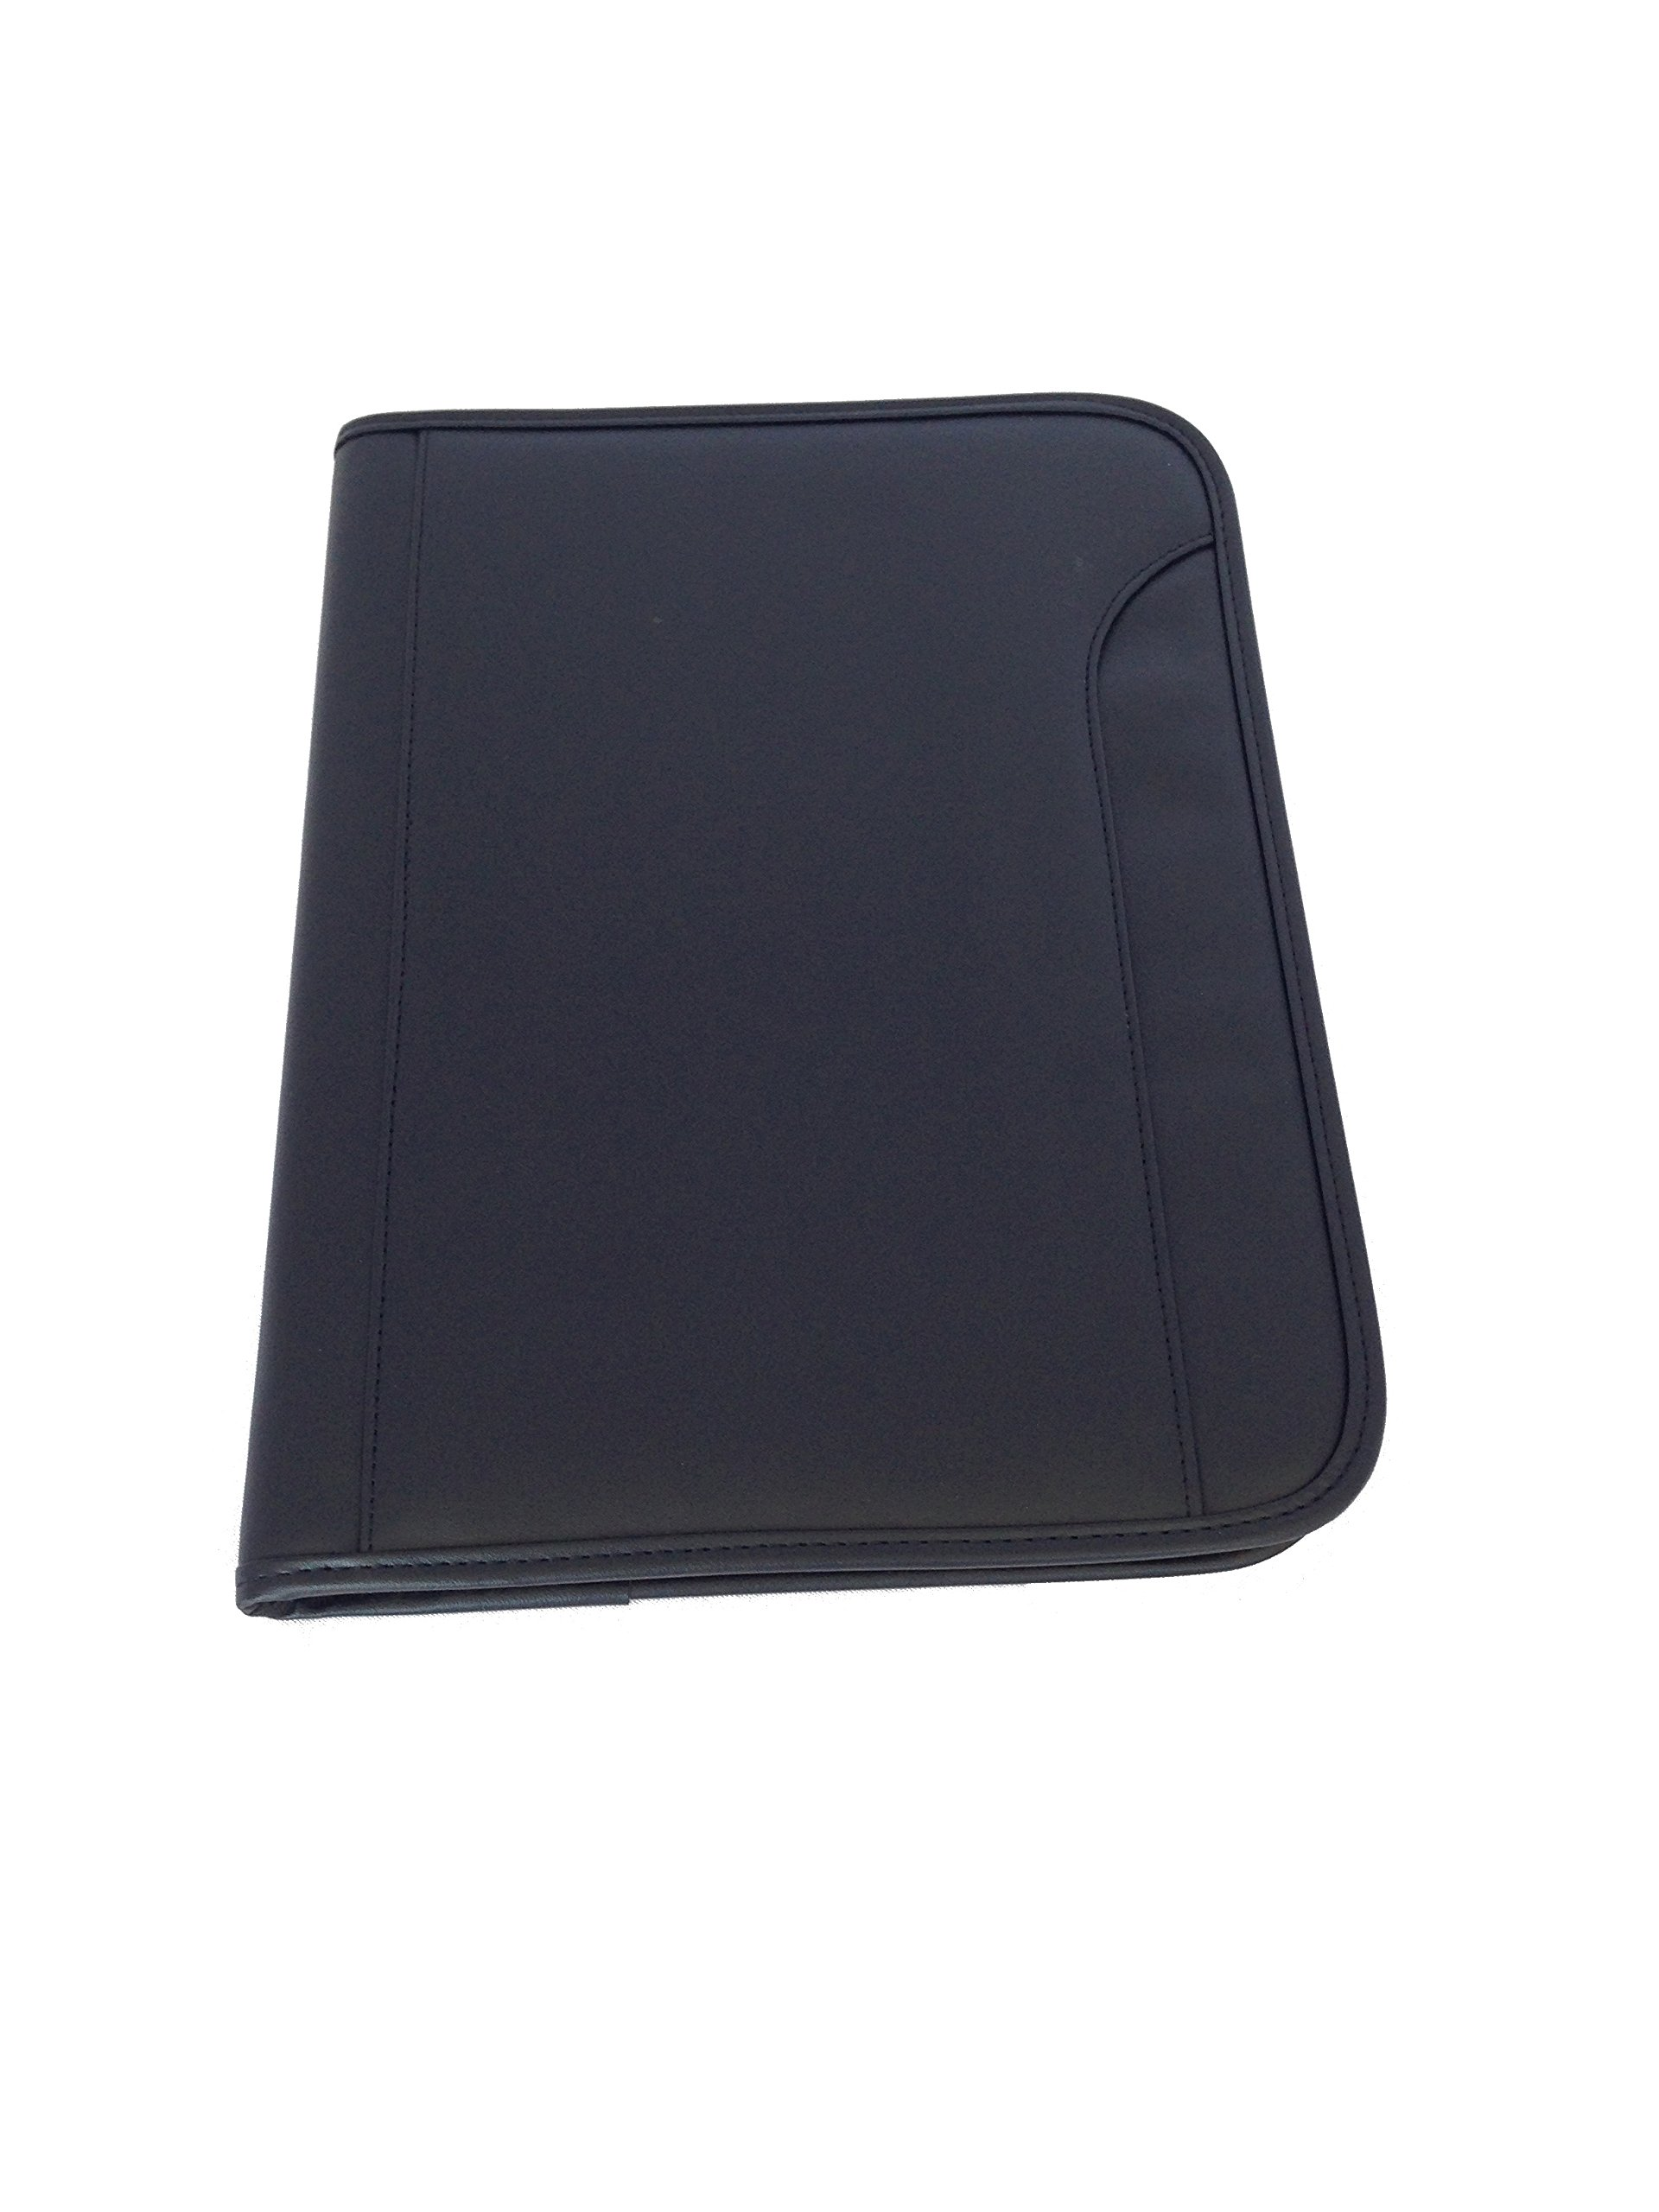 ImpecGear Padfolio Zippered Portfolio Interior 10.1 Inch Tablet Sleeve, Organizer Document Holder W/ Notepad & Pen Slot, Calculator (10'' x 13.5'' x 1.5'') by ImpecGear (Image #3)